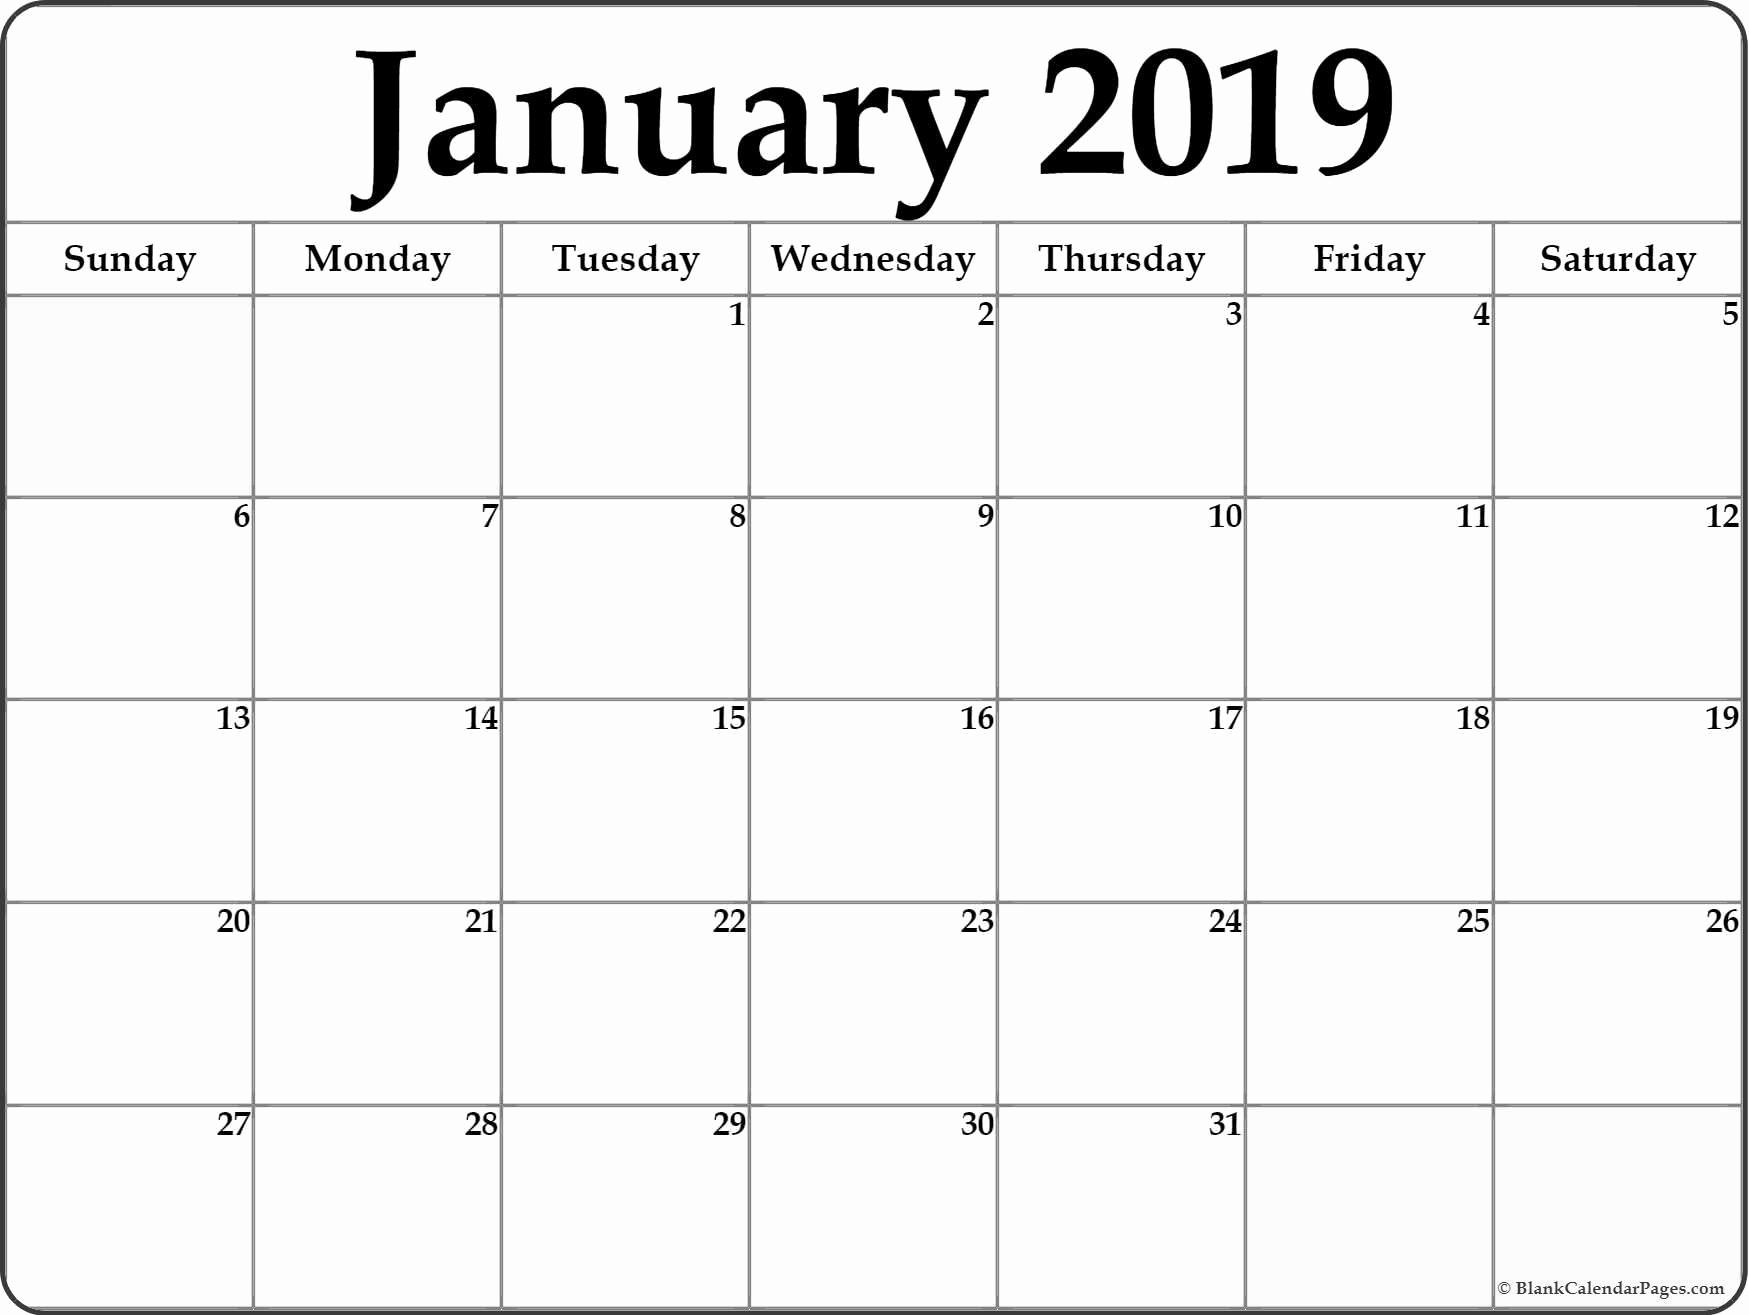 Free Printable Calendar Templates 2019 Luxury Image Result for Printable 2019 Calendar